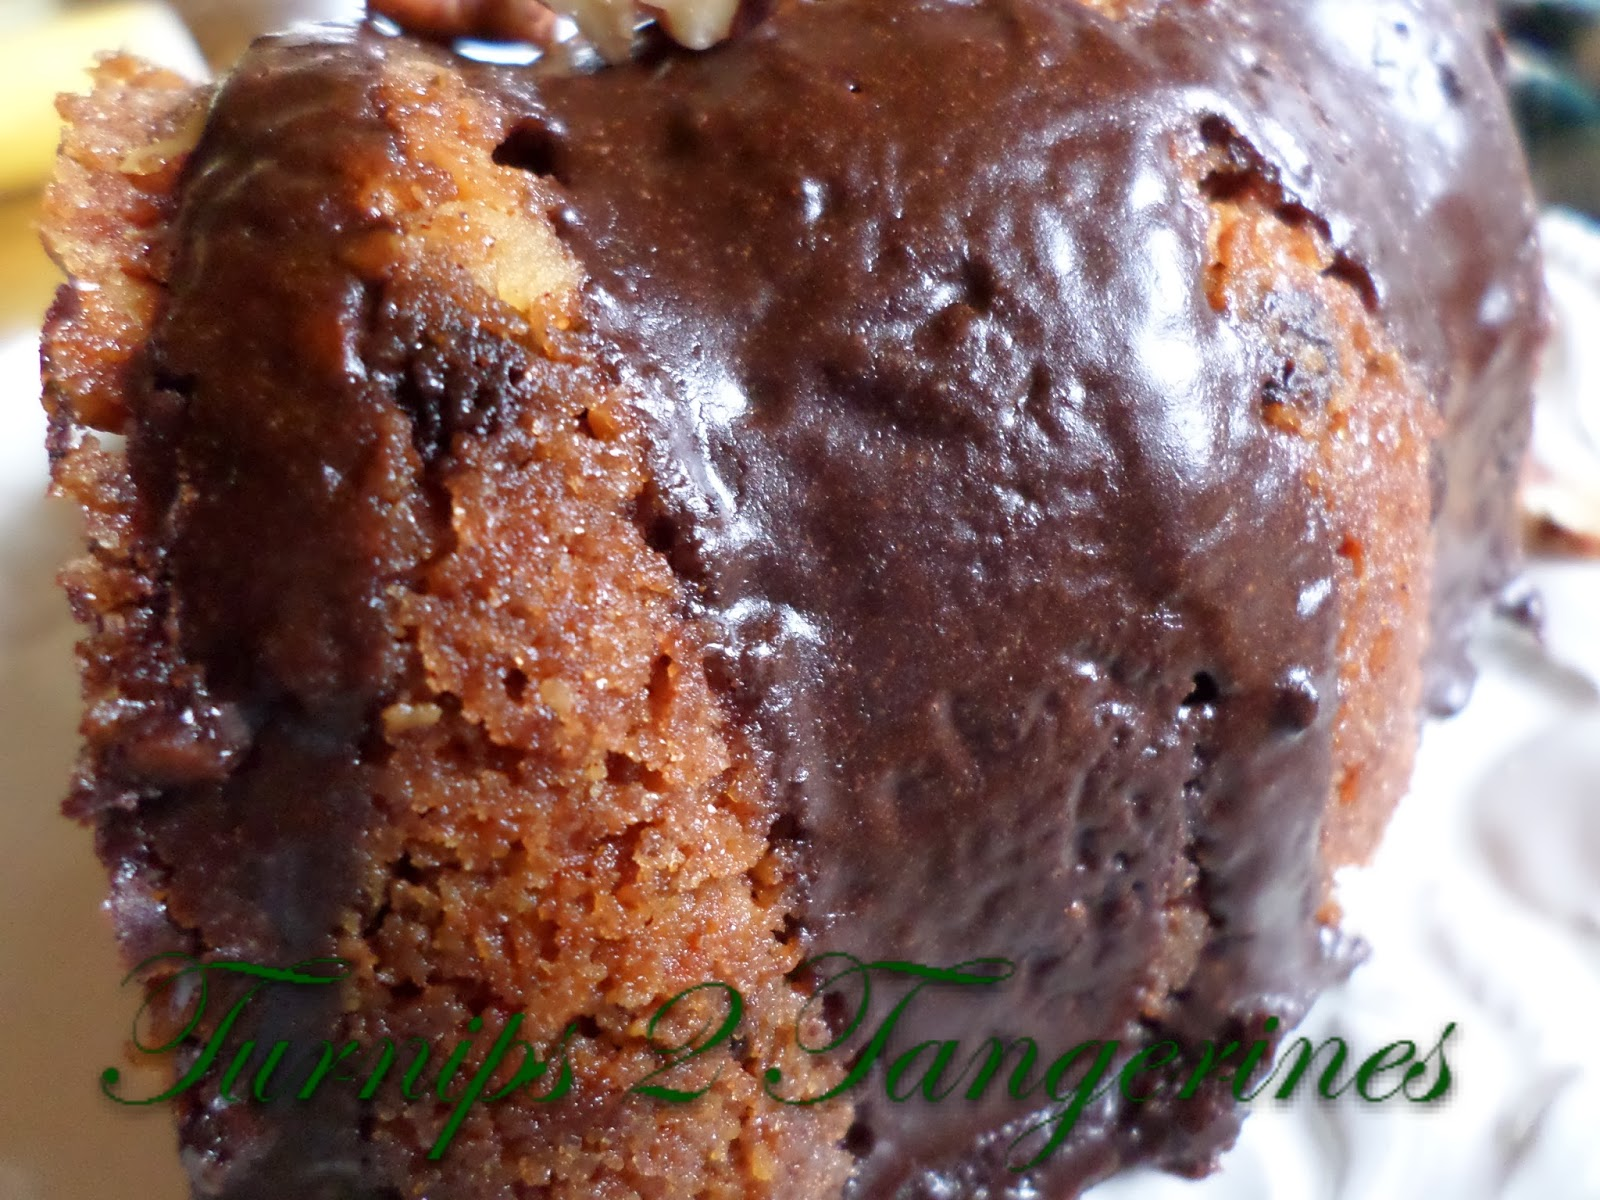 Chocolate Chip Banana Monkey Bread